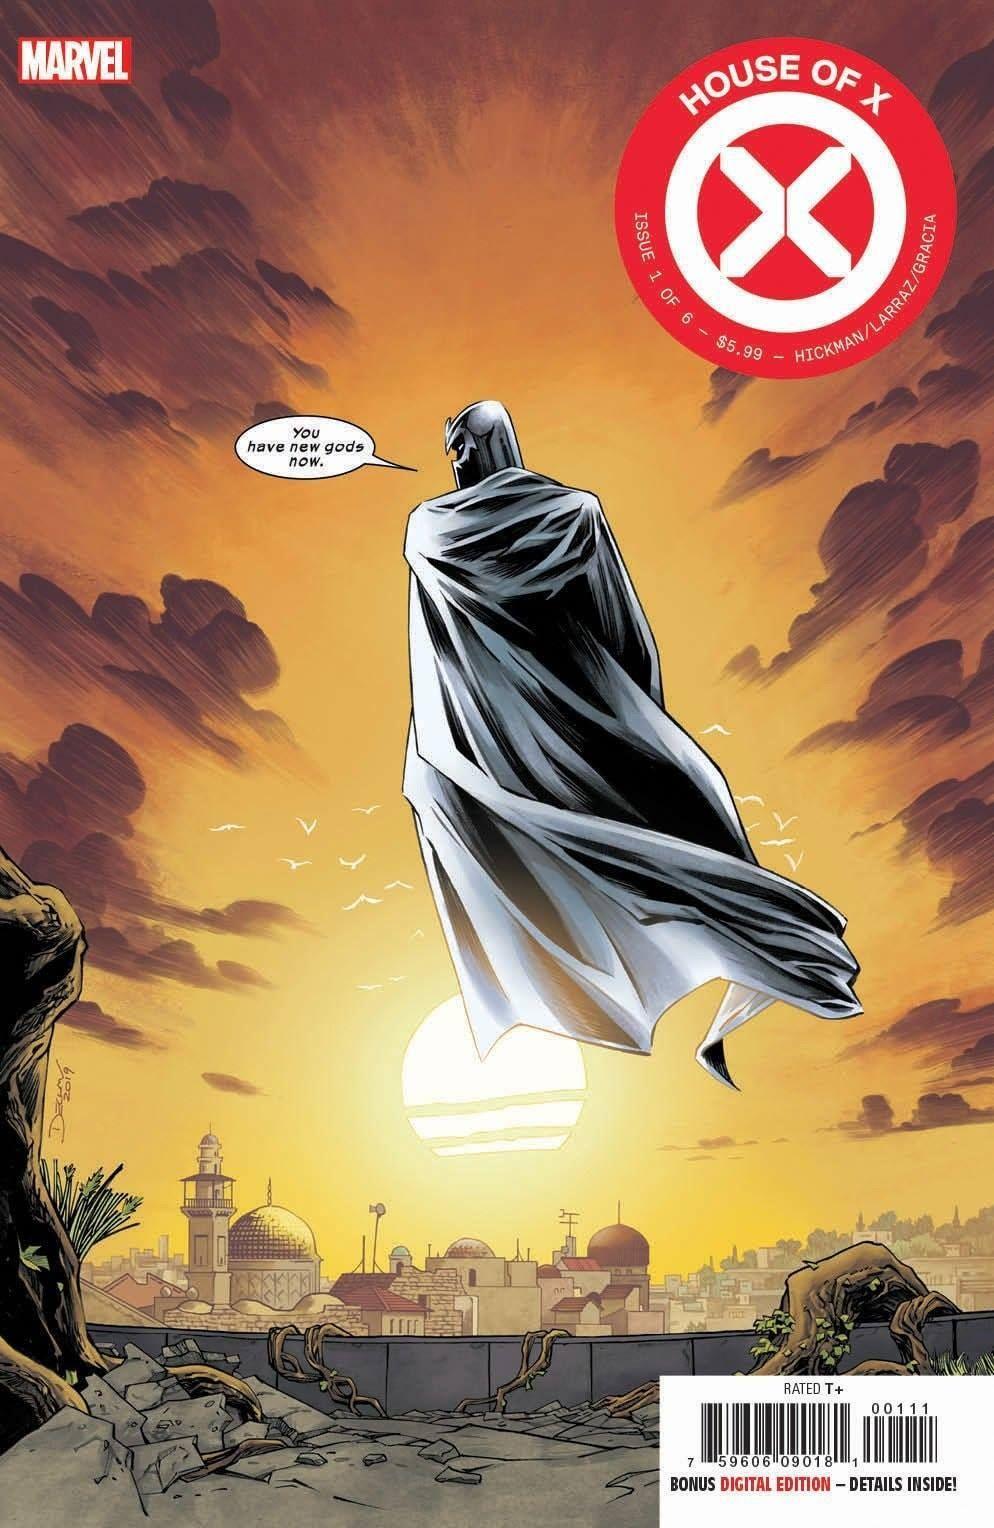 House Of X 1 Variant Cover Magneto By Declan Shalvey 3rd Reprint Cover Marvel Marvel Comics Art Marvel Comics